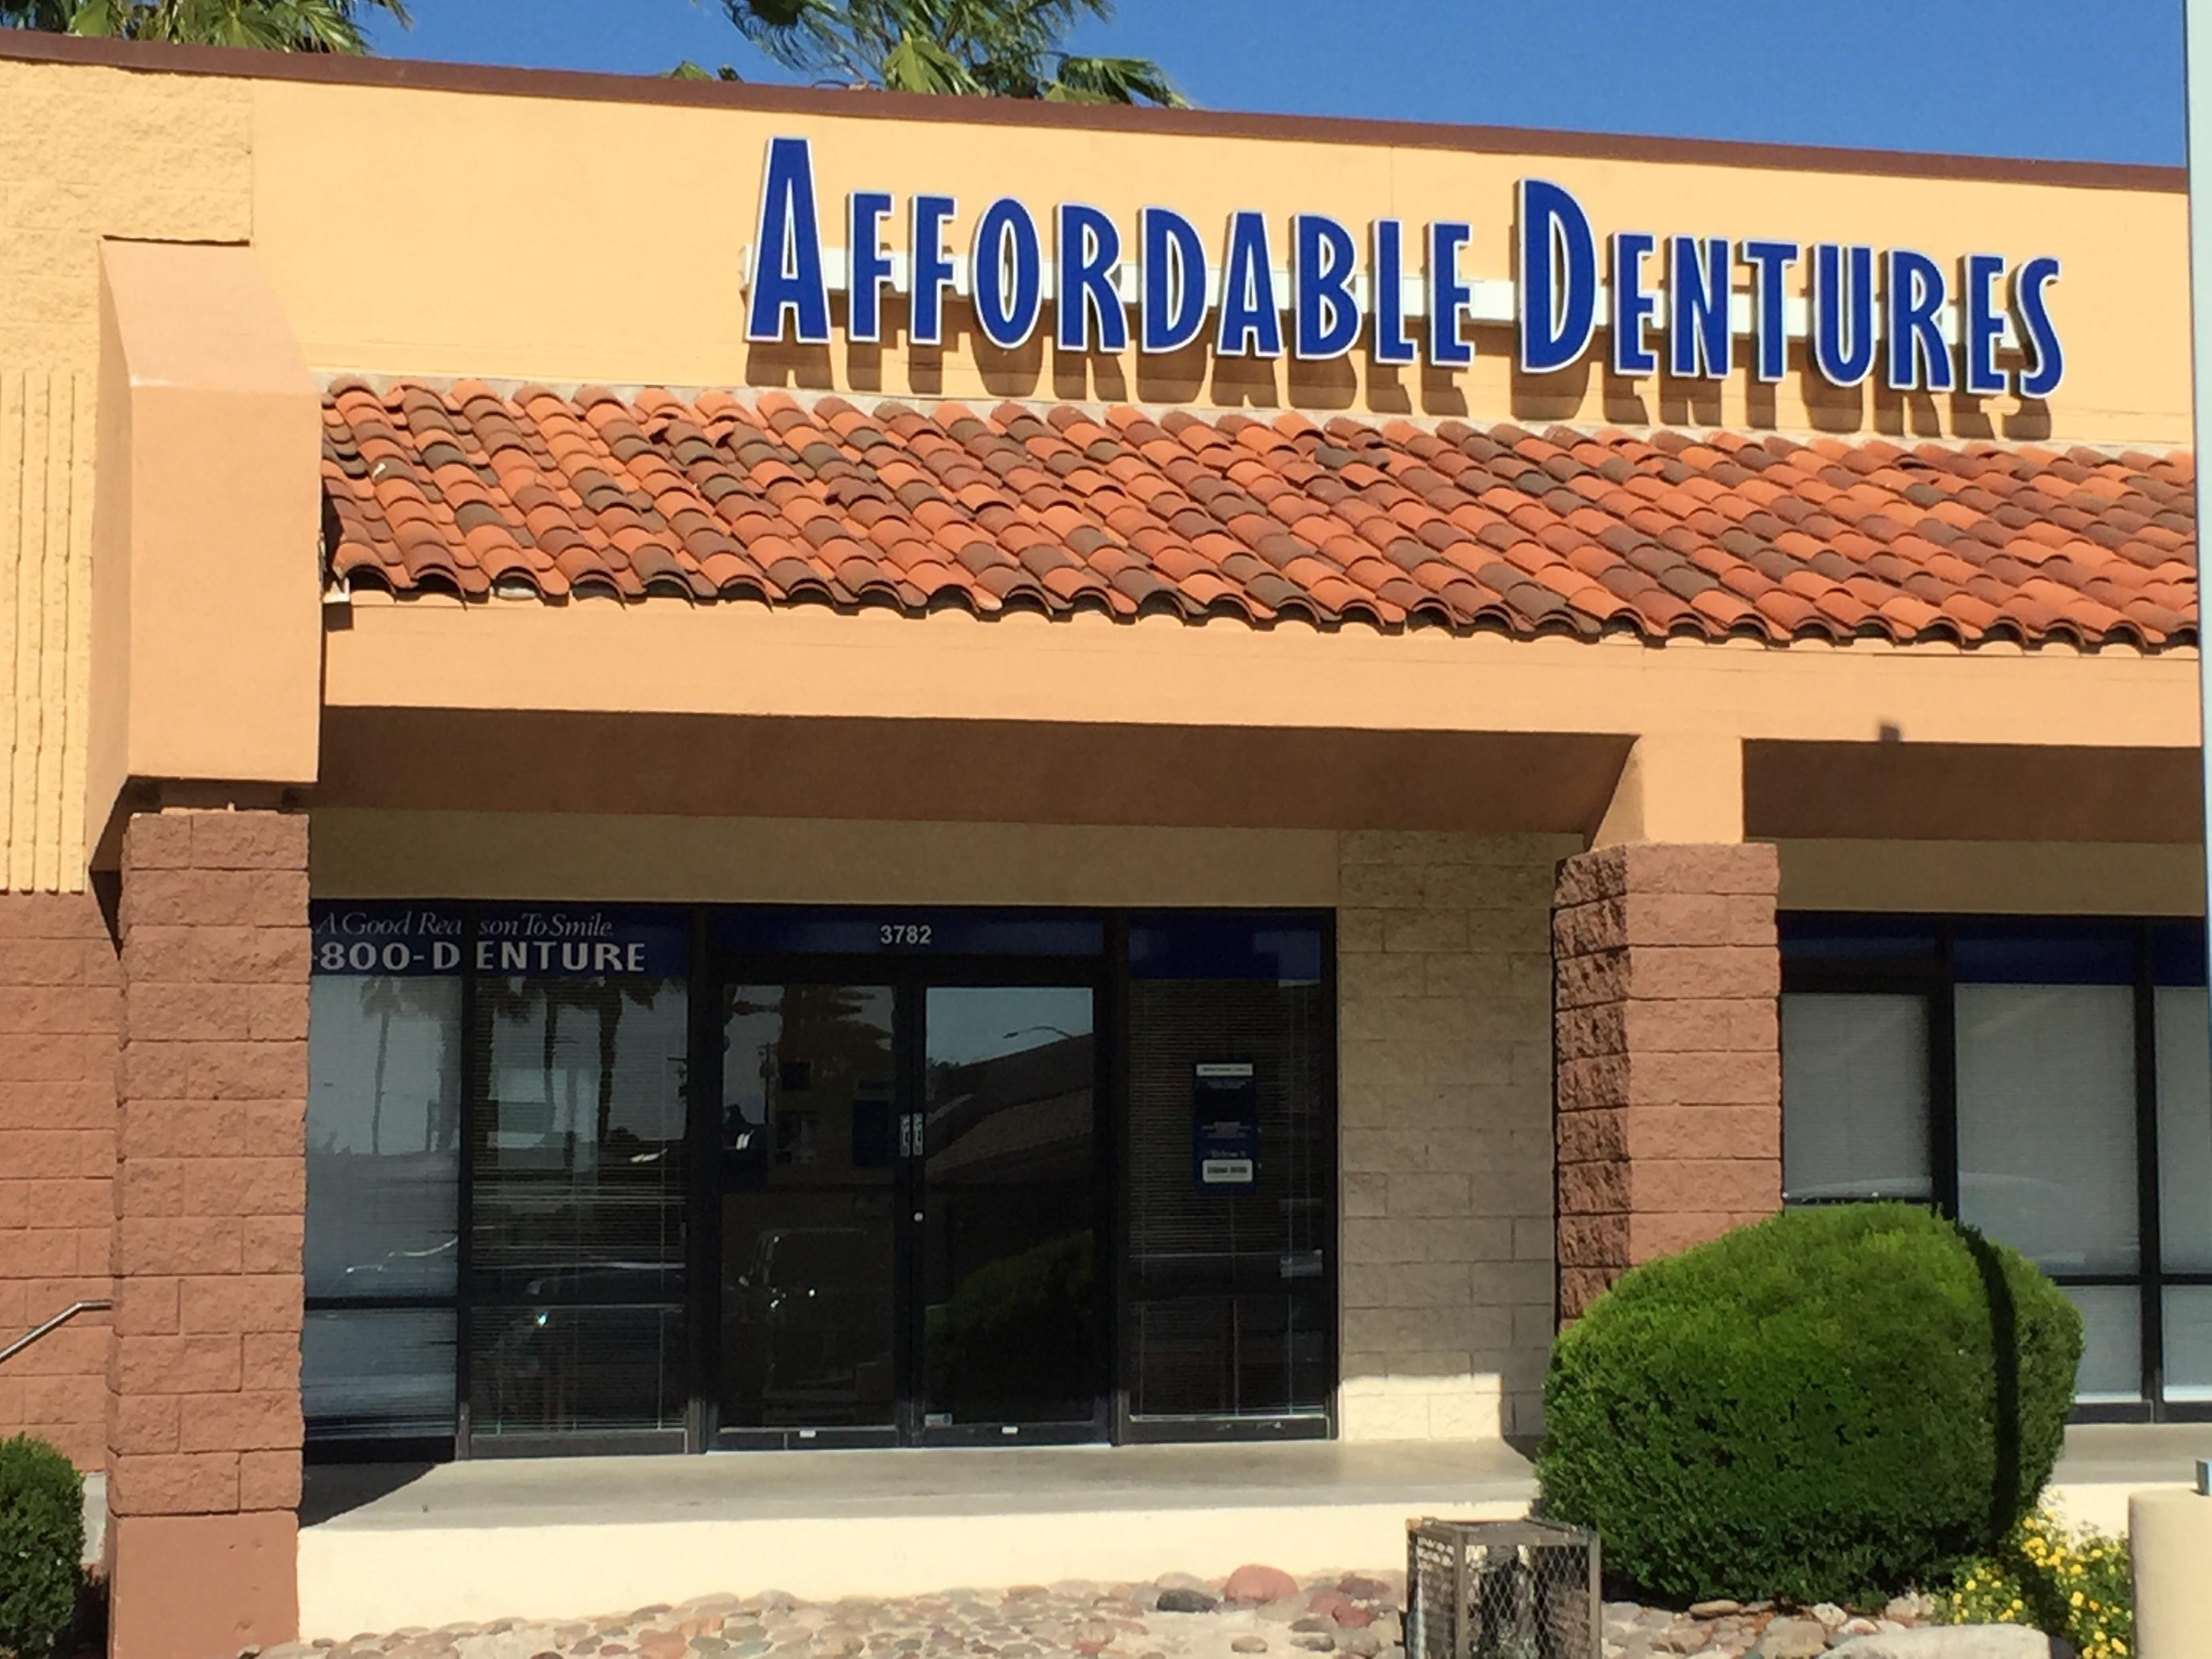 Dental Implants Periodontist in AZ Tucson 85713 Affordable Dentures & Implants 3782 South 16th Avenue  (520)375-9626